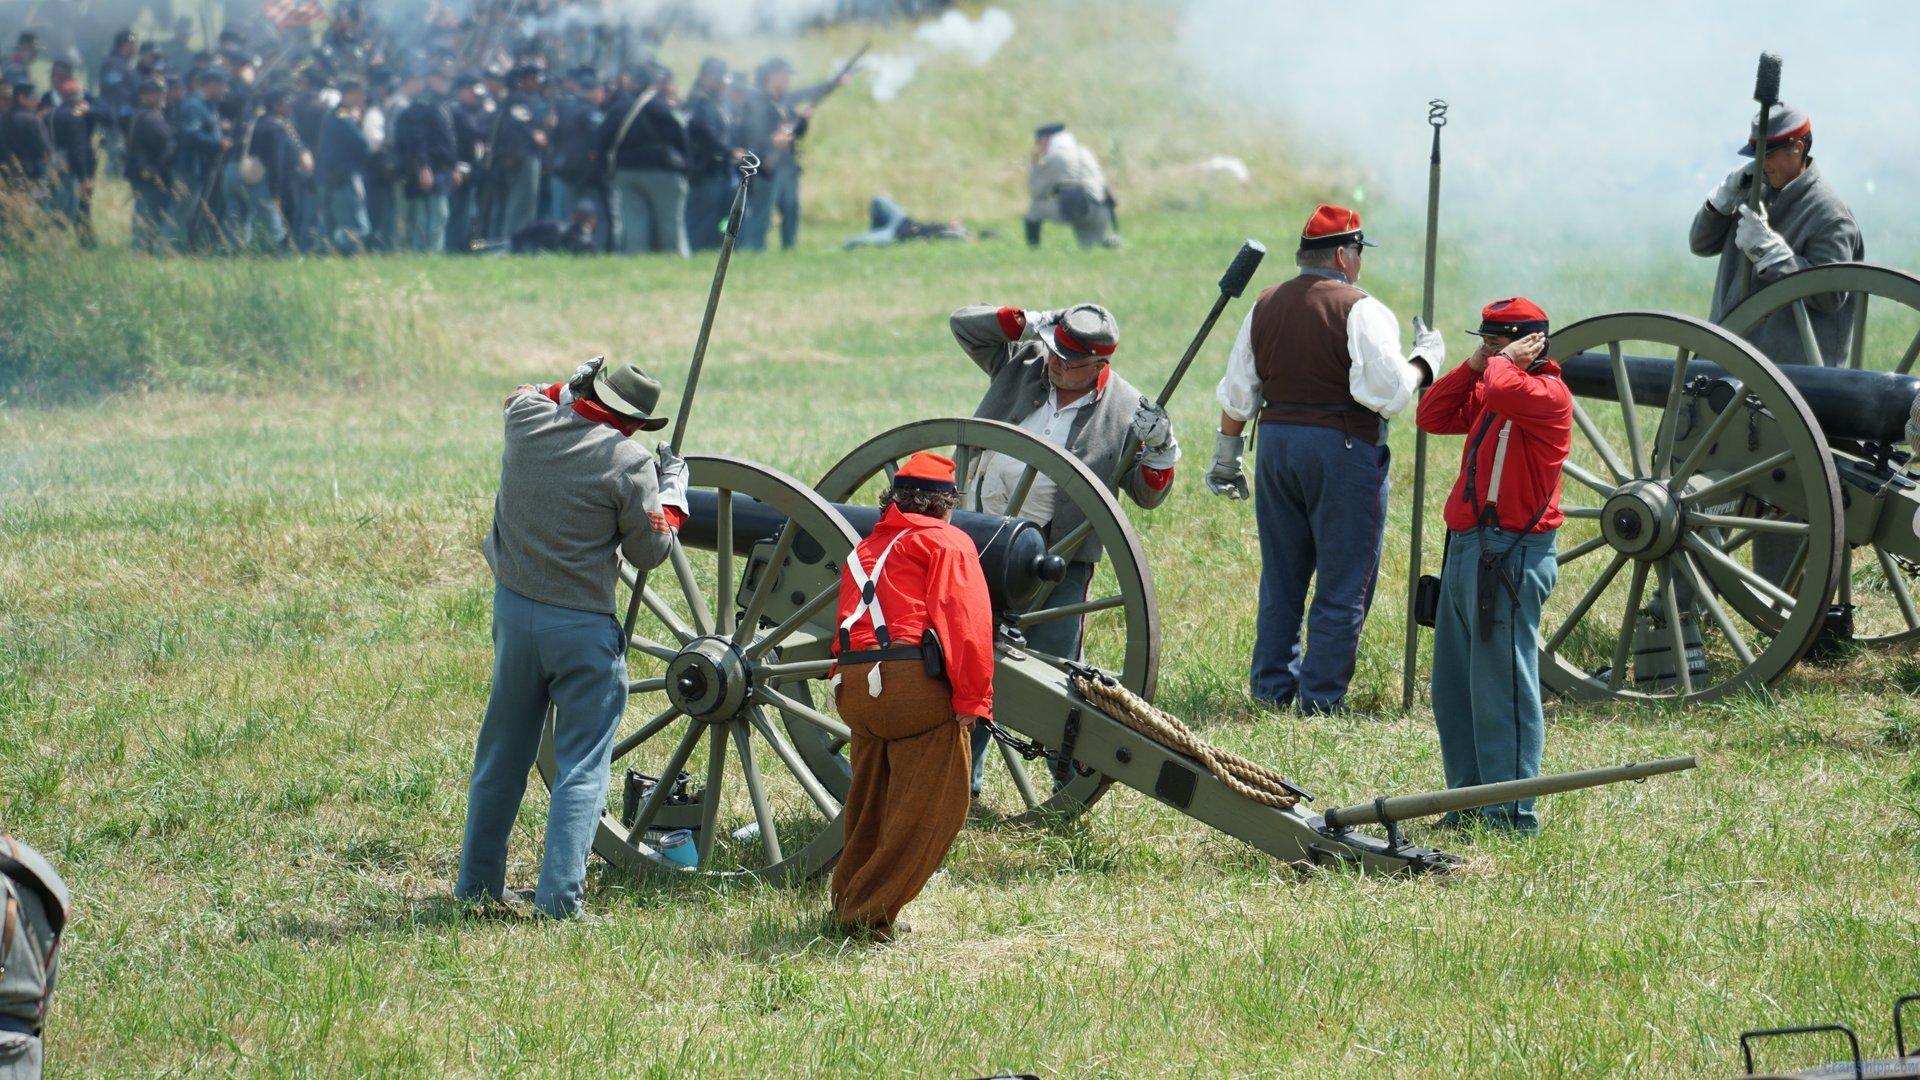 Best time for Gettysburg Civil War Battle Reenactment in Pennsylvania 2020